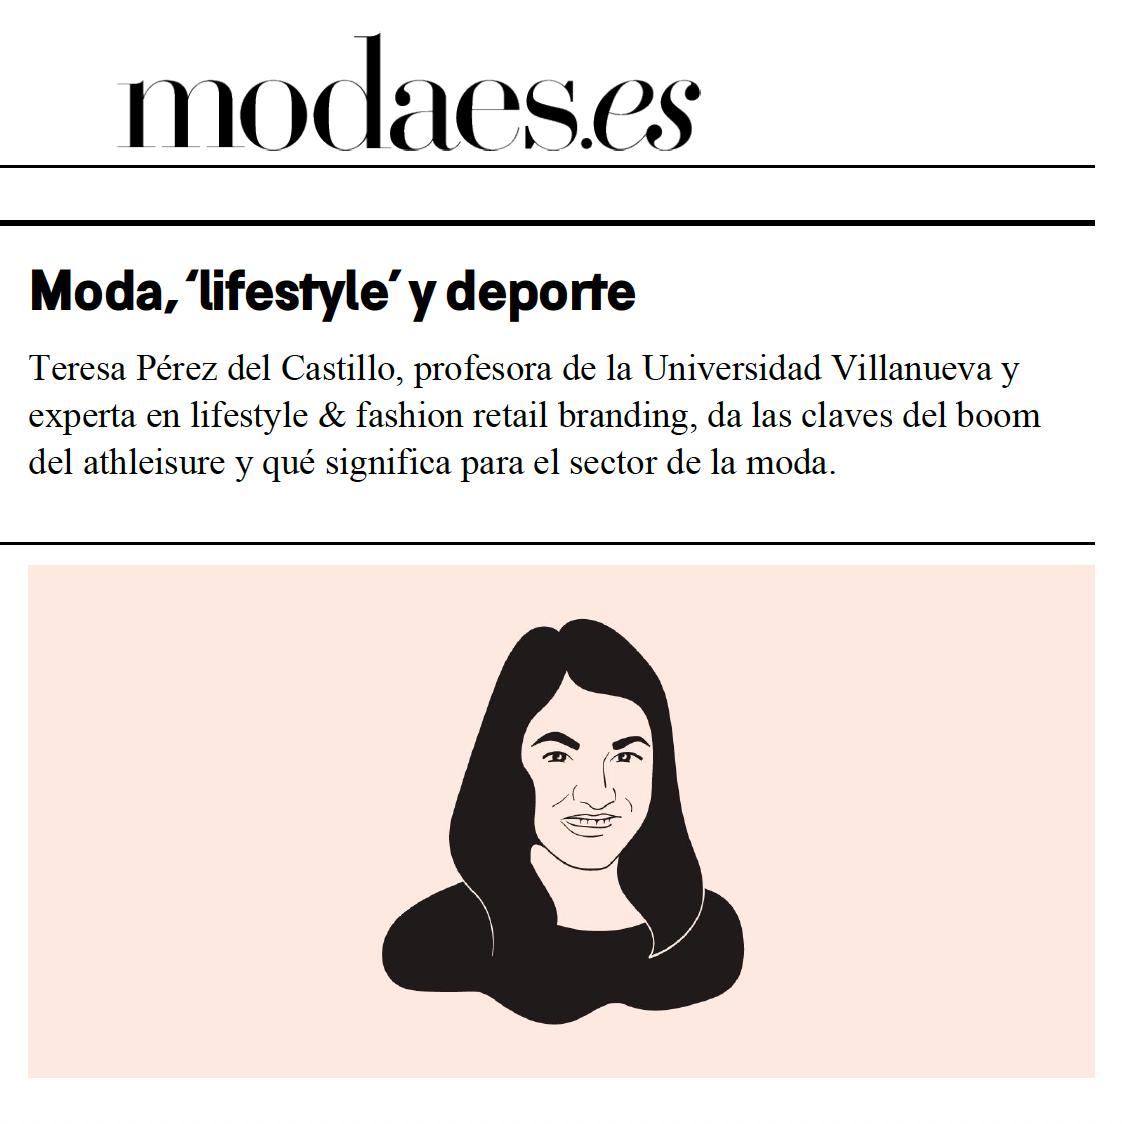 Moda, lifestyle y deporte